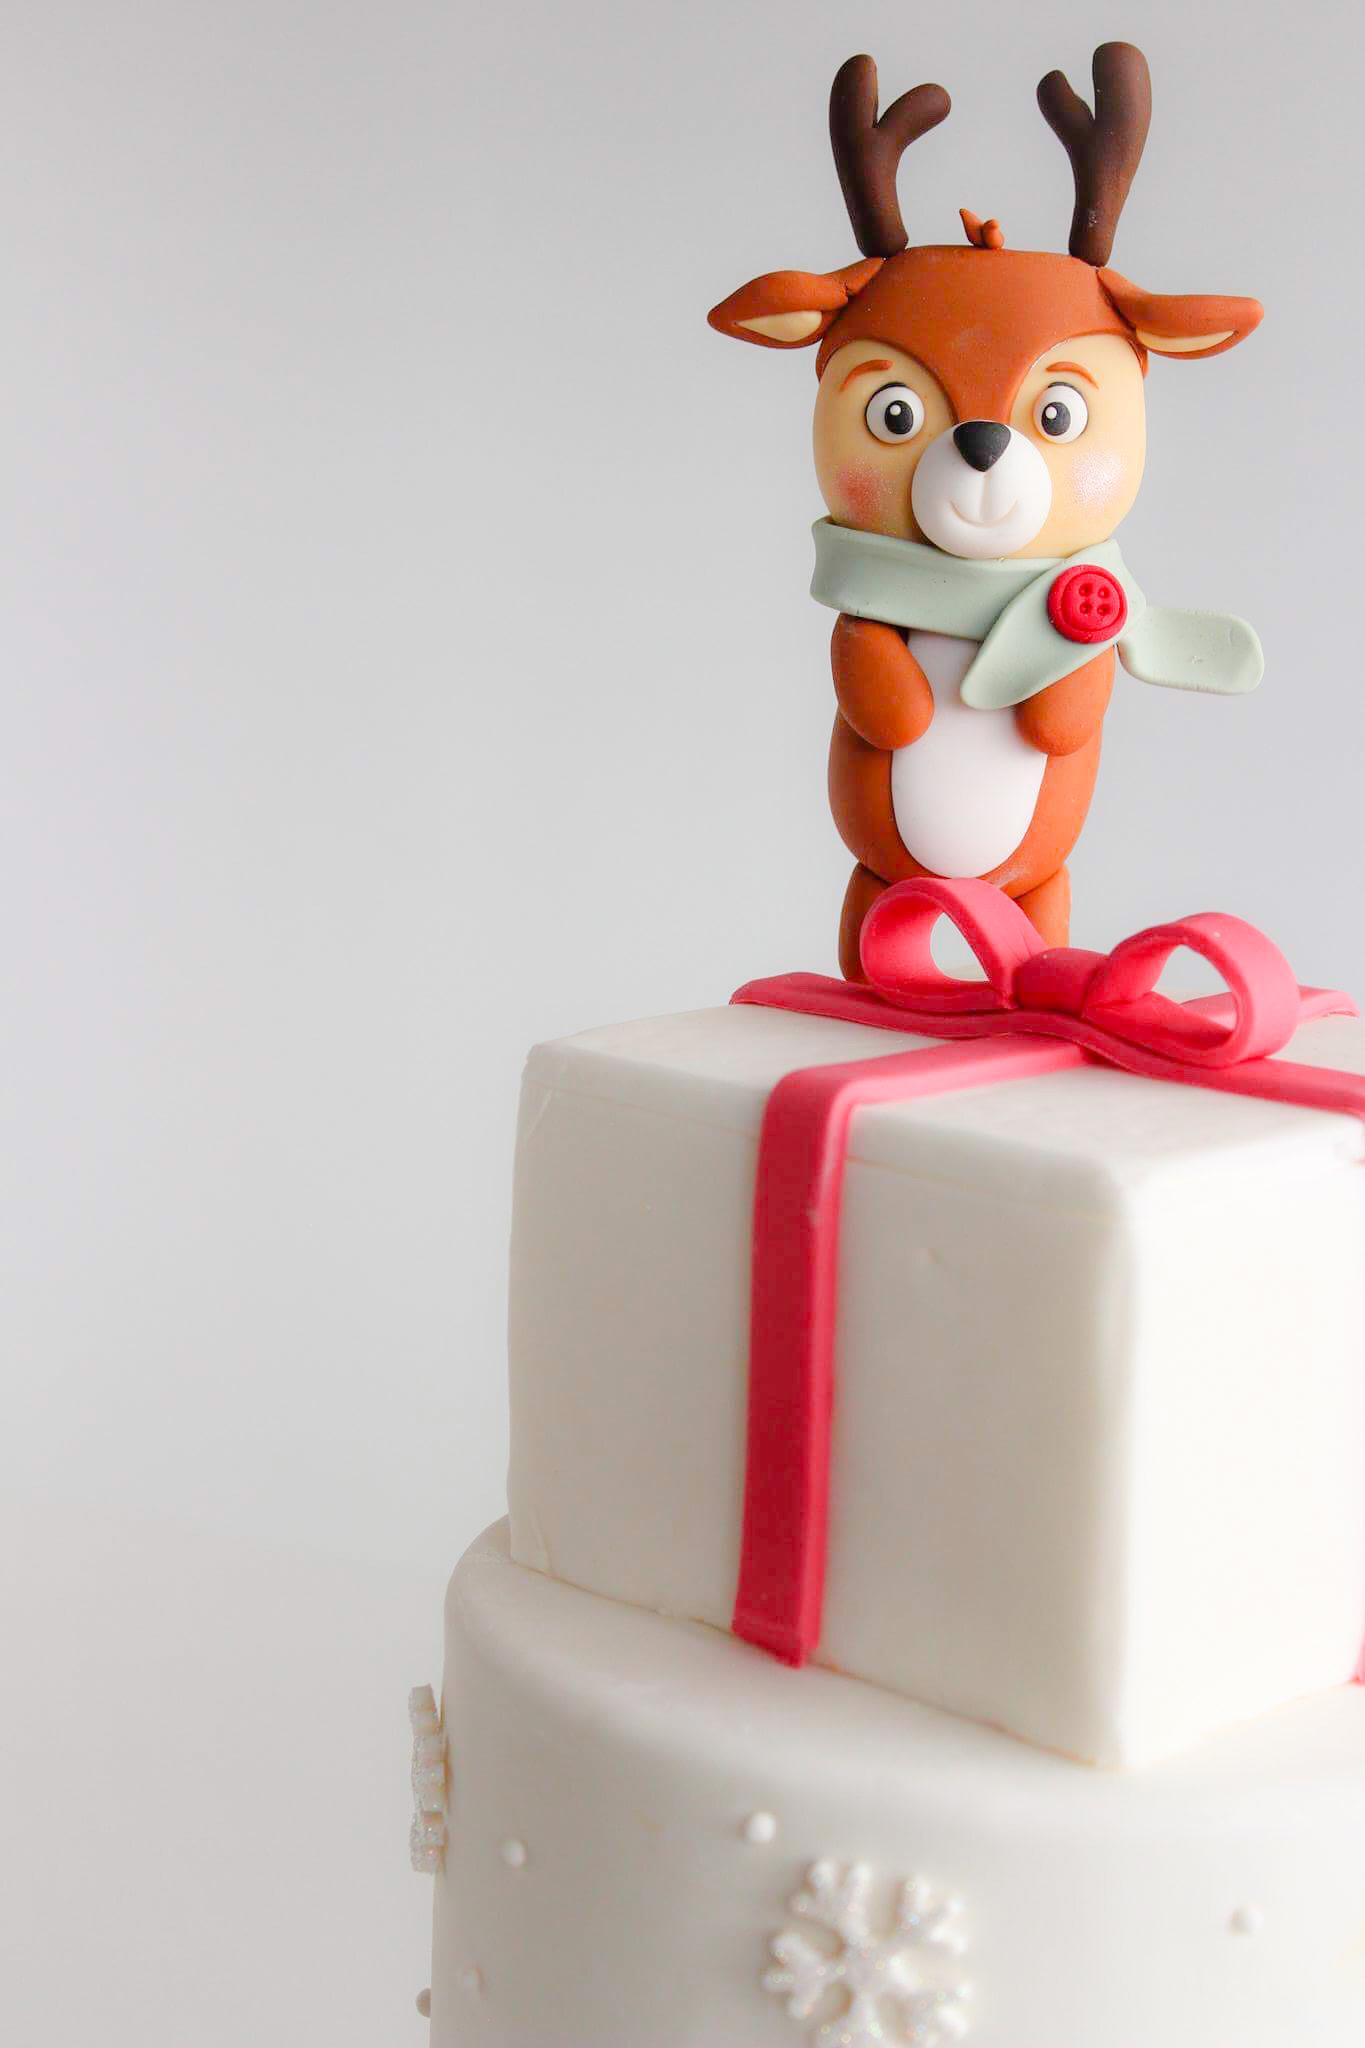 Reindeer Christmas birthday cake